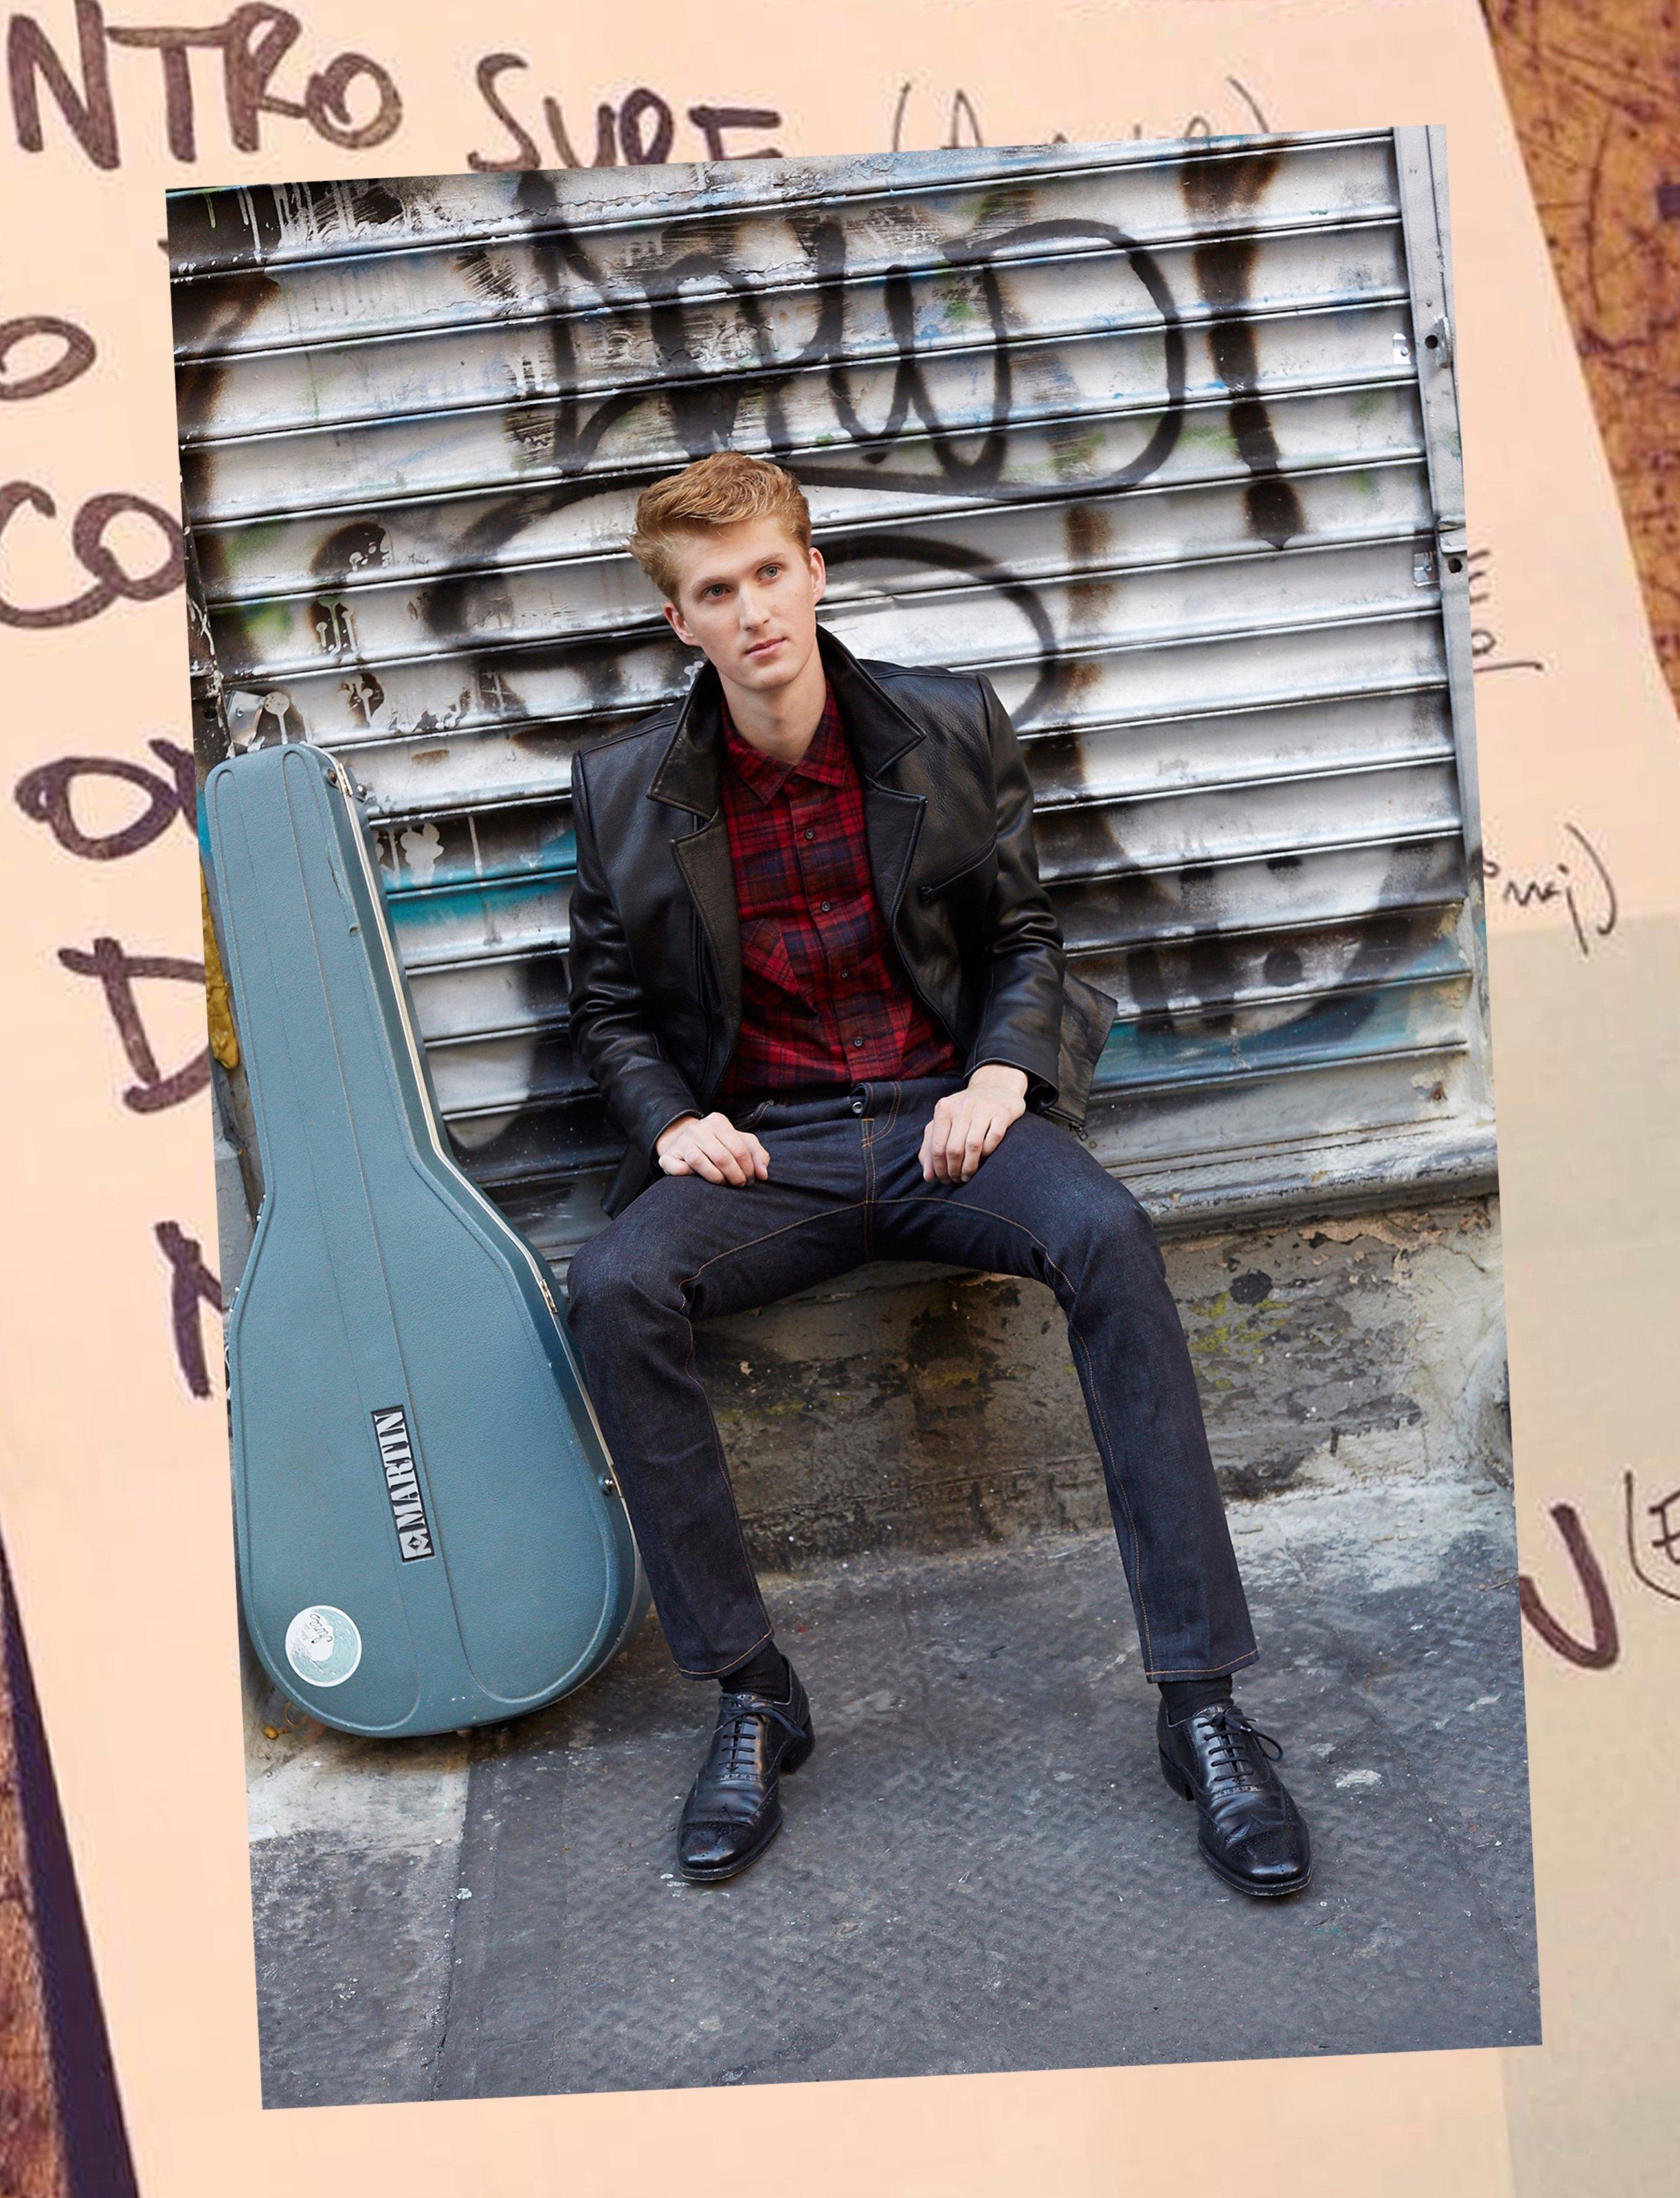 shooting on the streets of Soho w/ Arthur Elgort. New York, NY. October 2015.